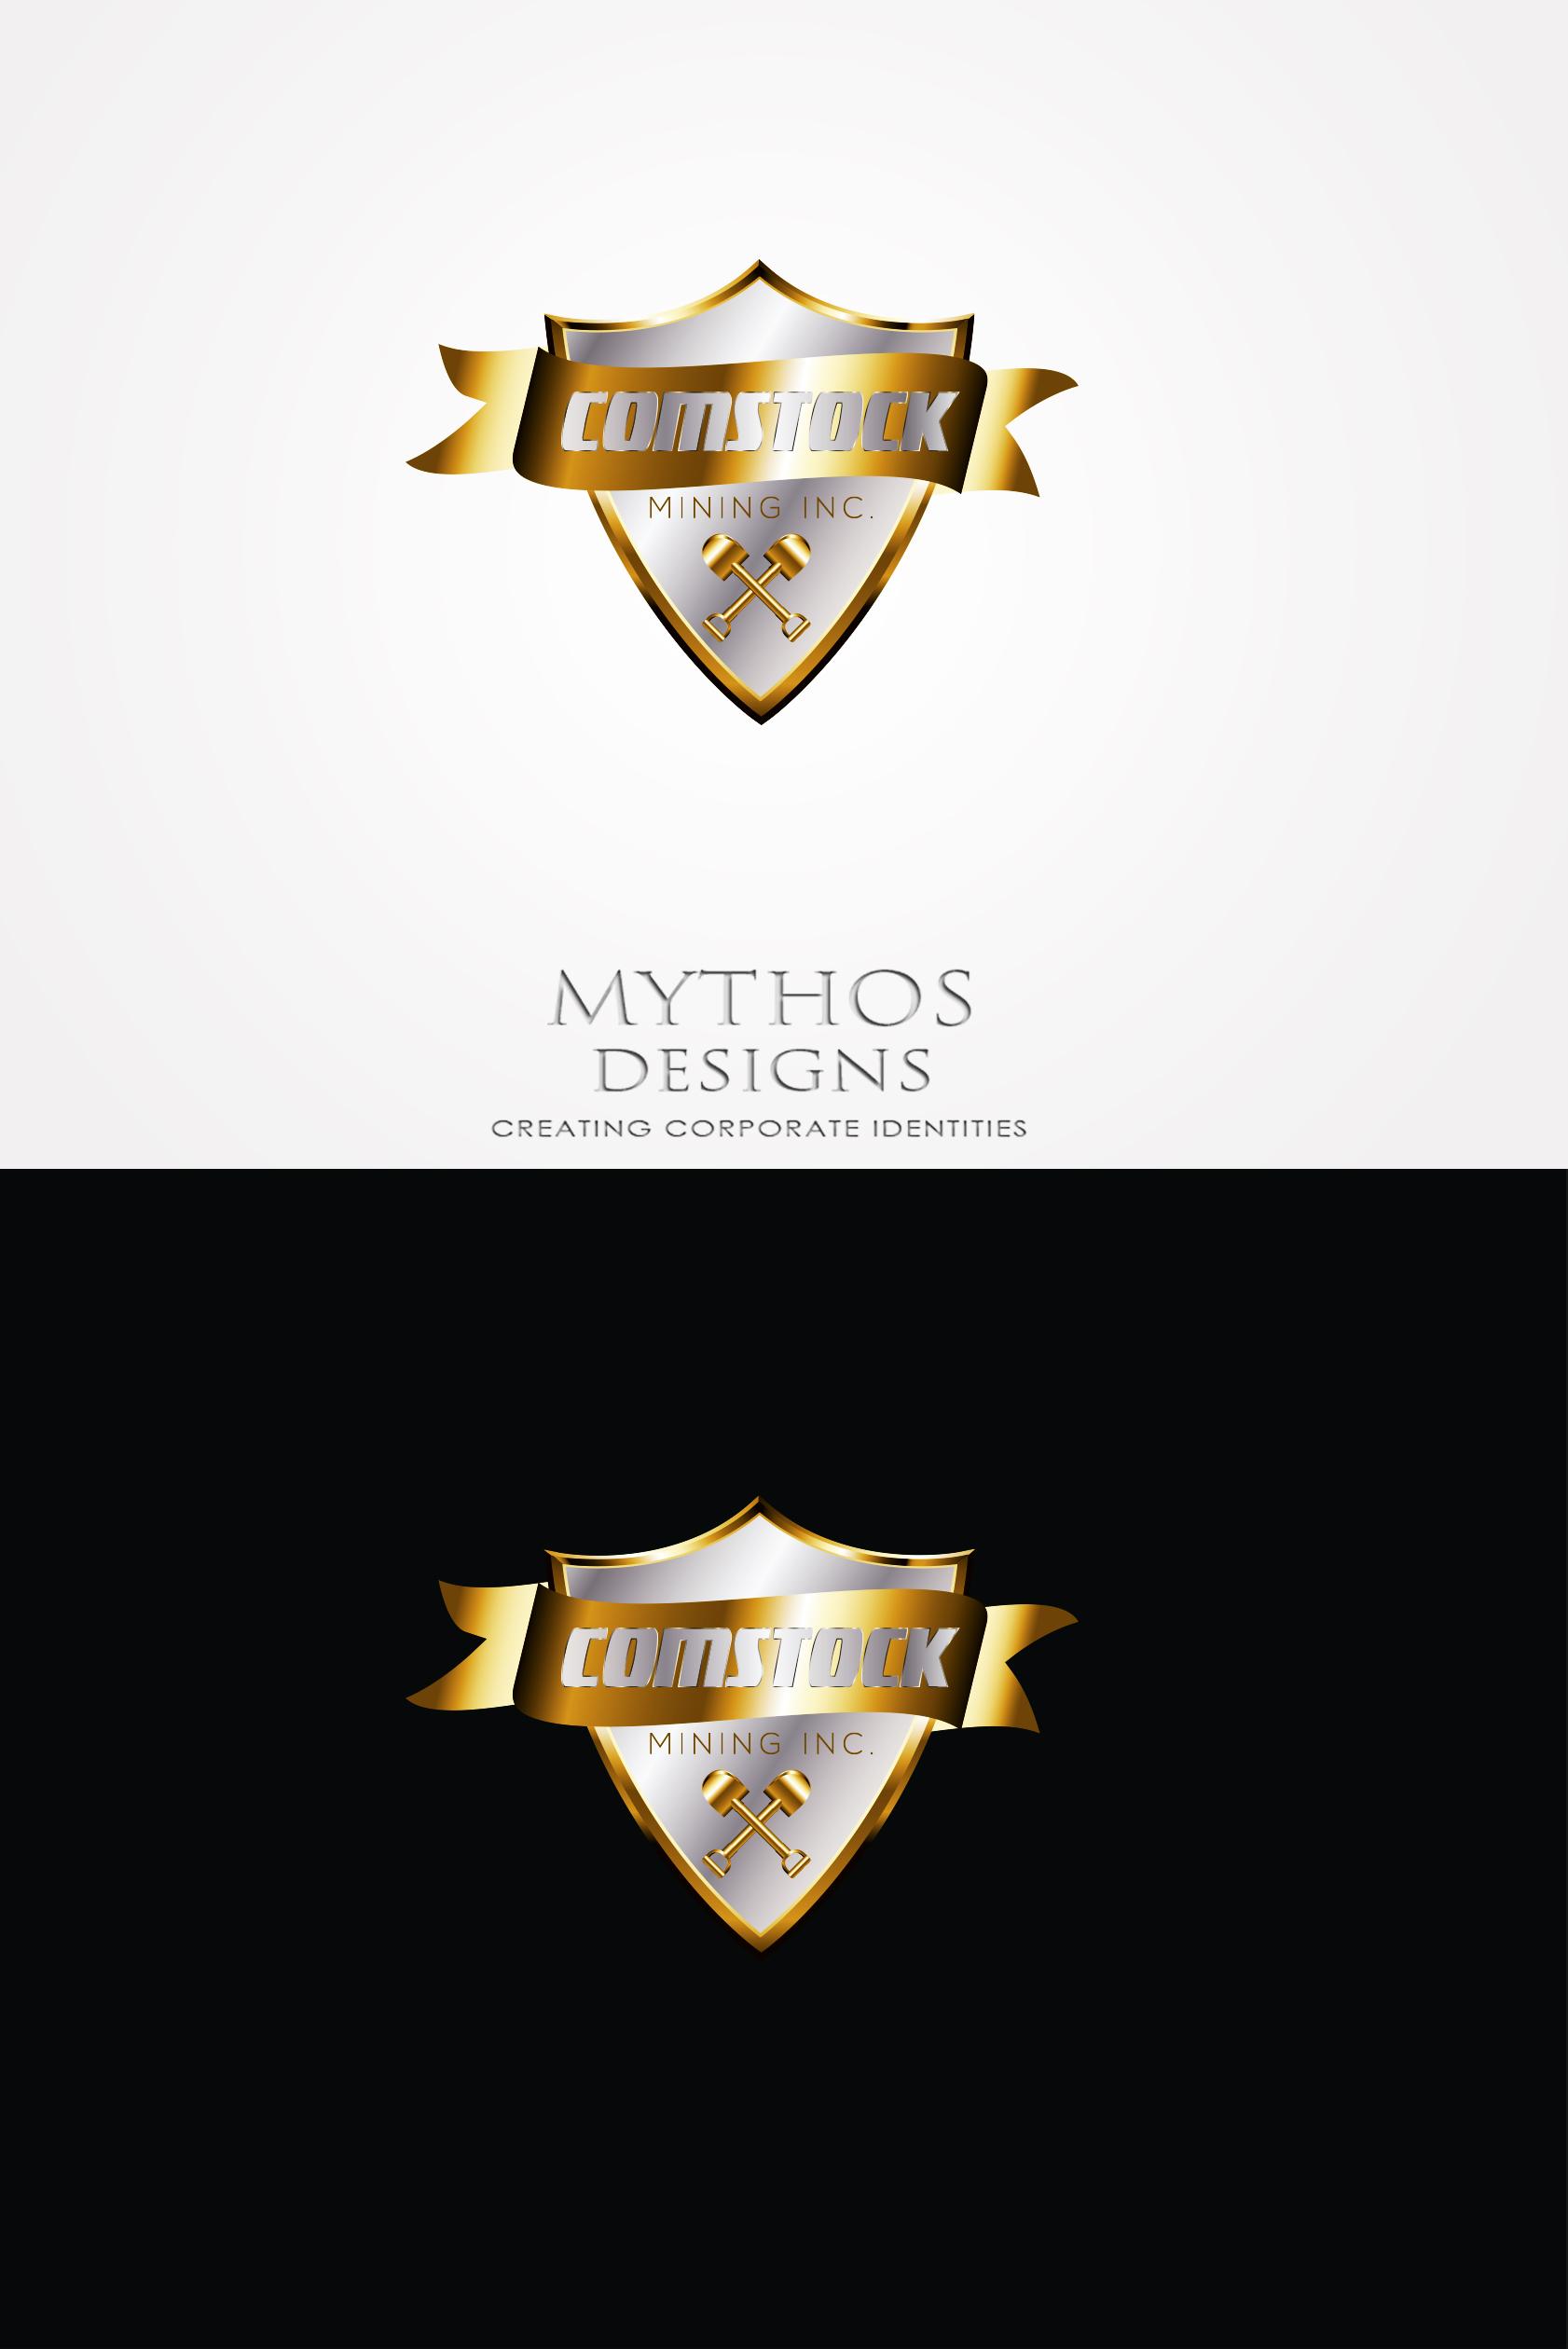 Logo Design by Mythos Designs - Entry No. 82 in the Logo Design Contest Captivating Logo Design for Comstock Mining, Inc..